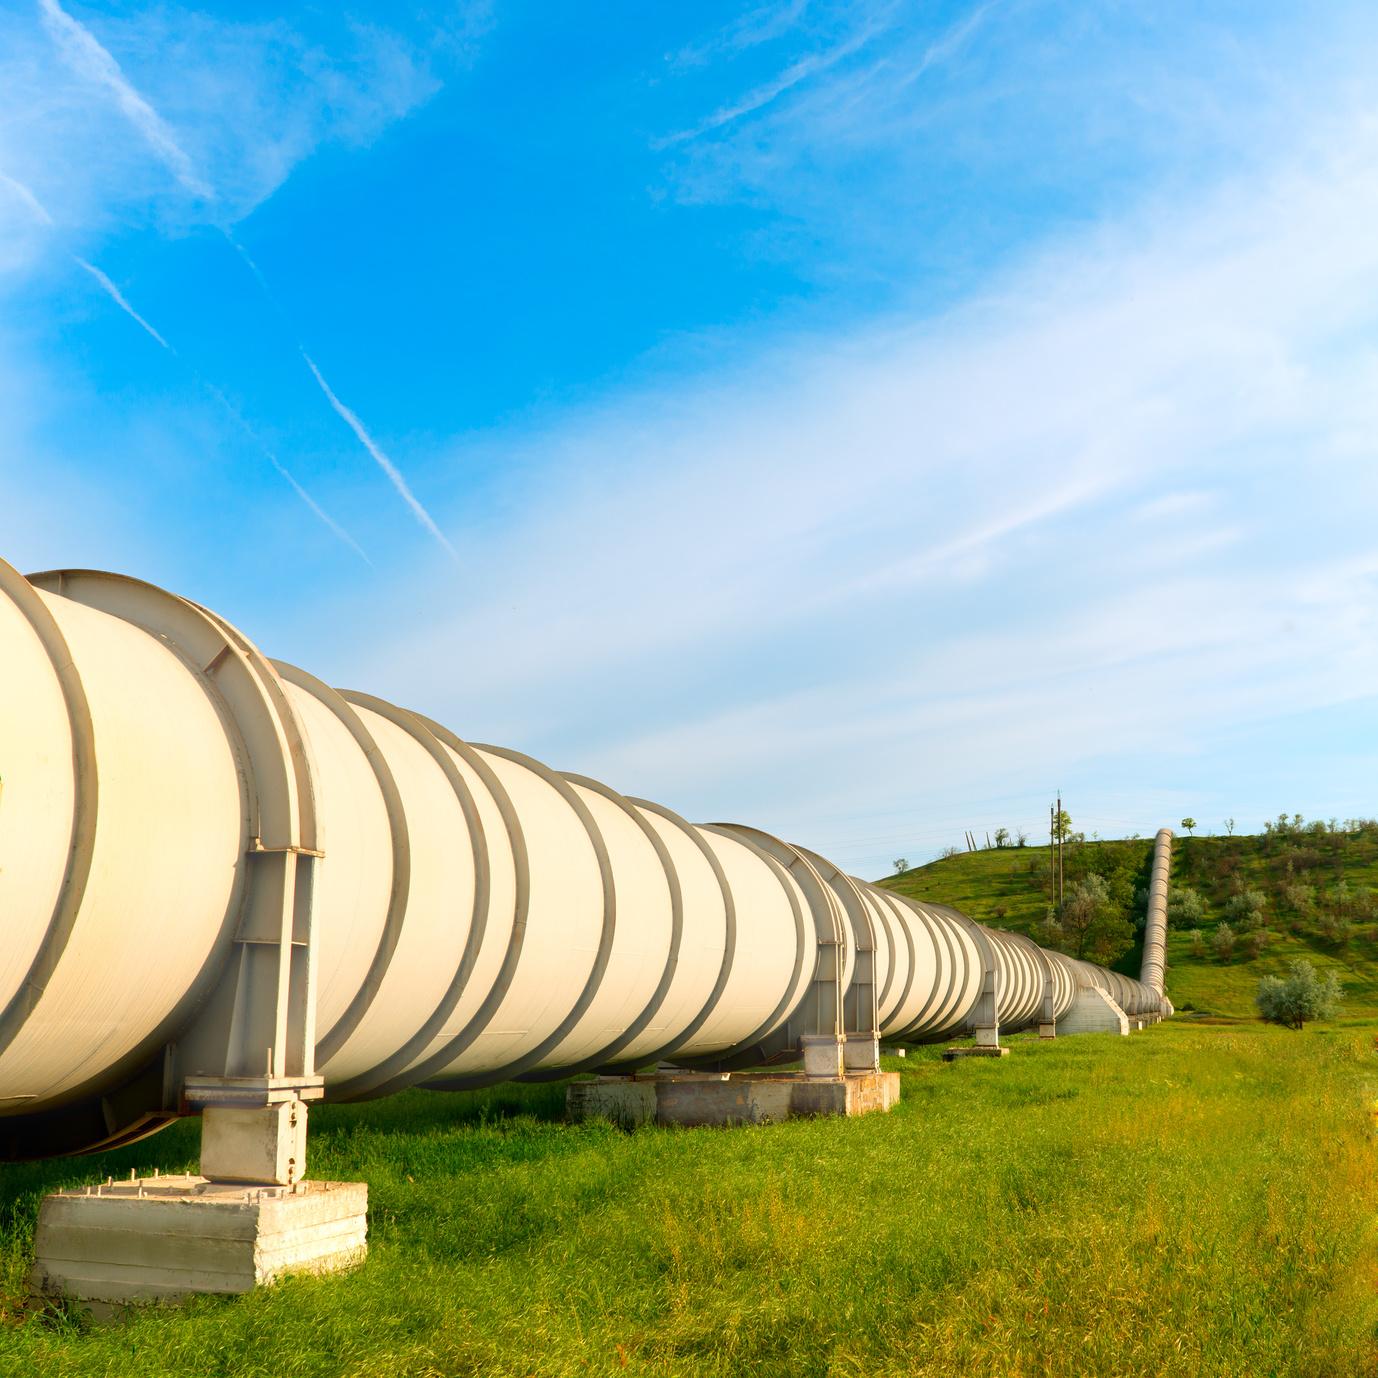 Fotolia_52775842_High Pressure Pipeline_M